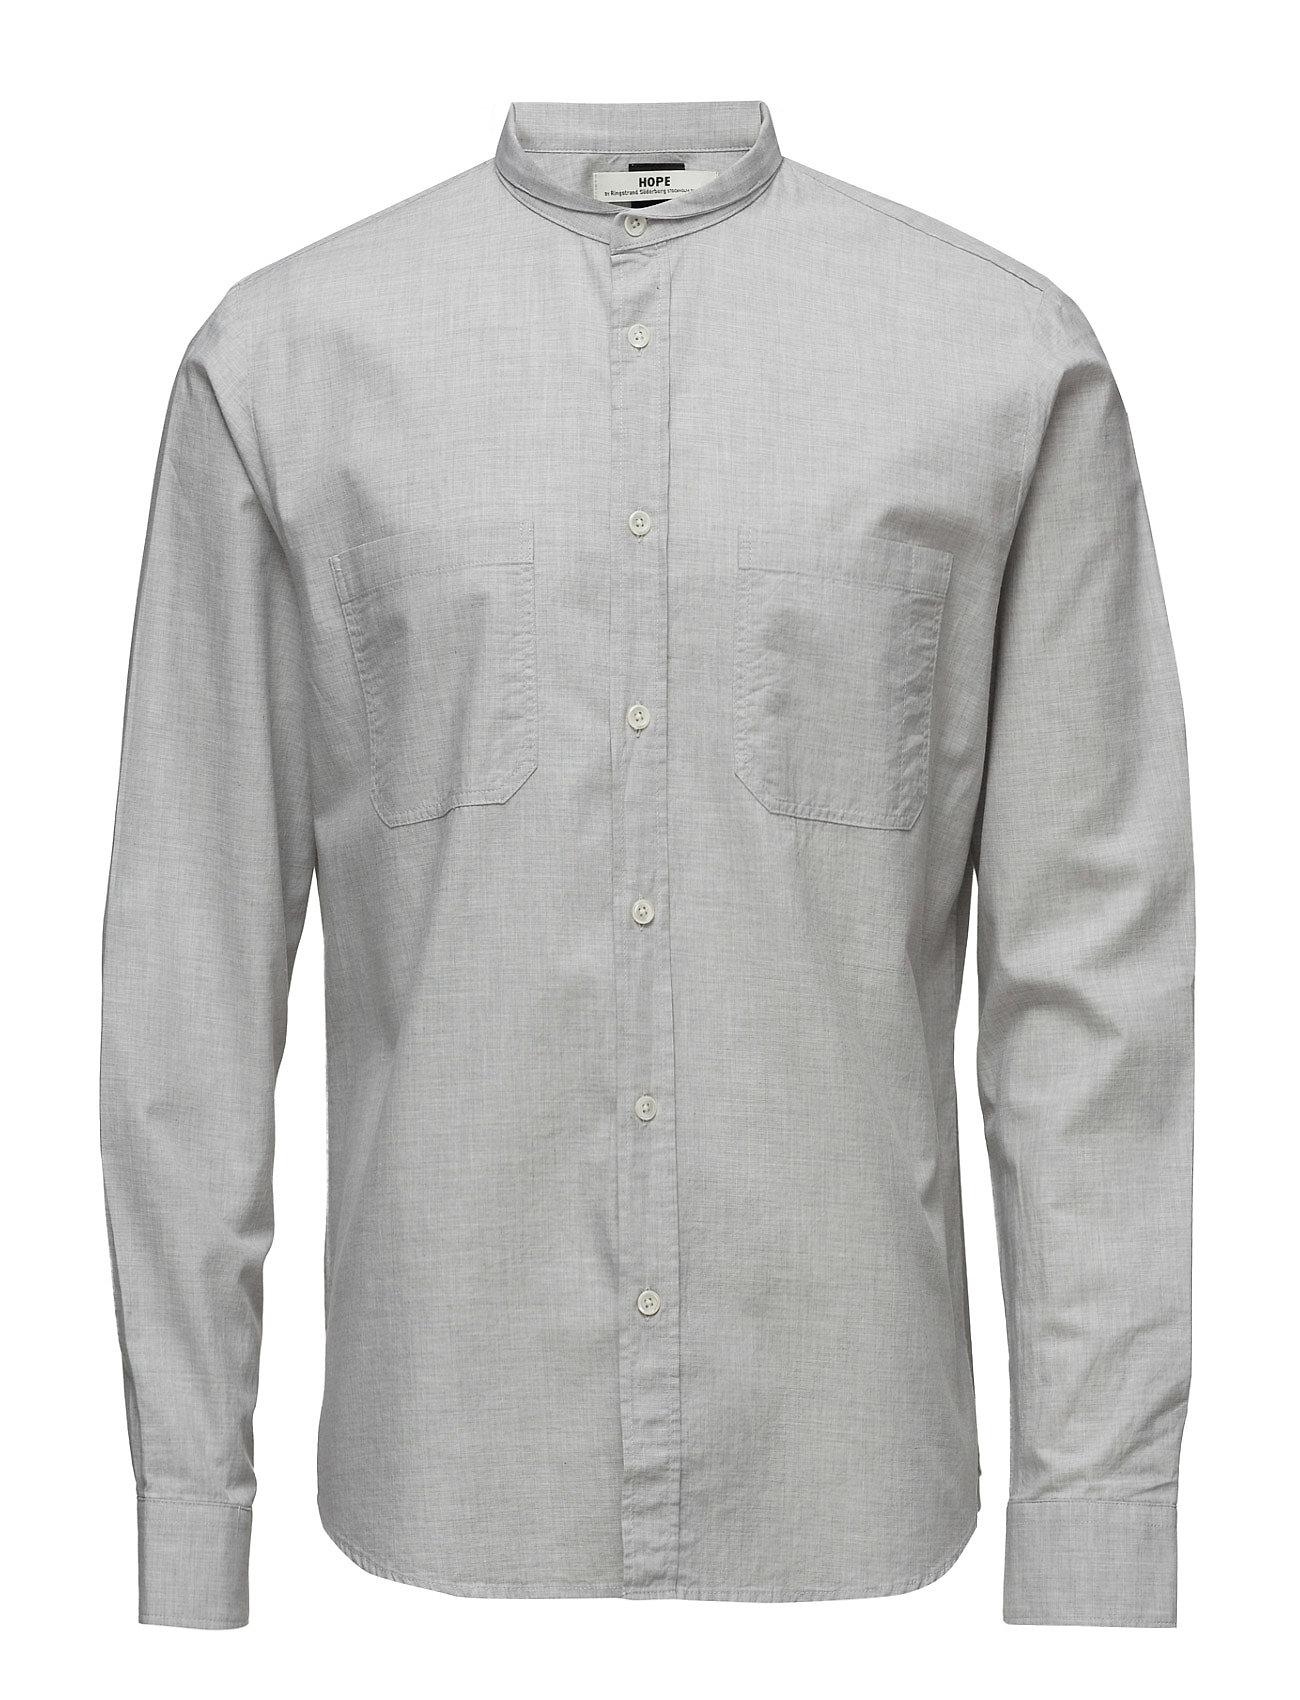 Rick Shirt Hope Casual sko til Herrer i Lt Grey